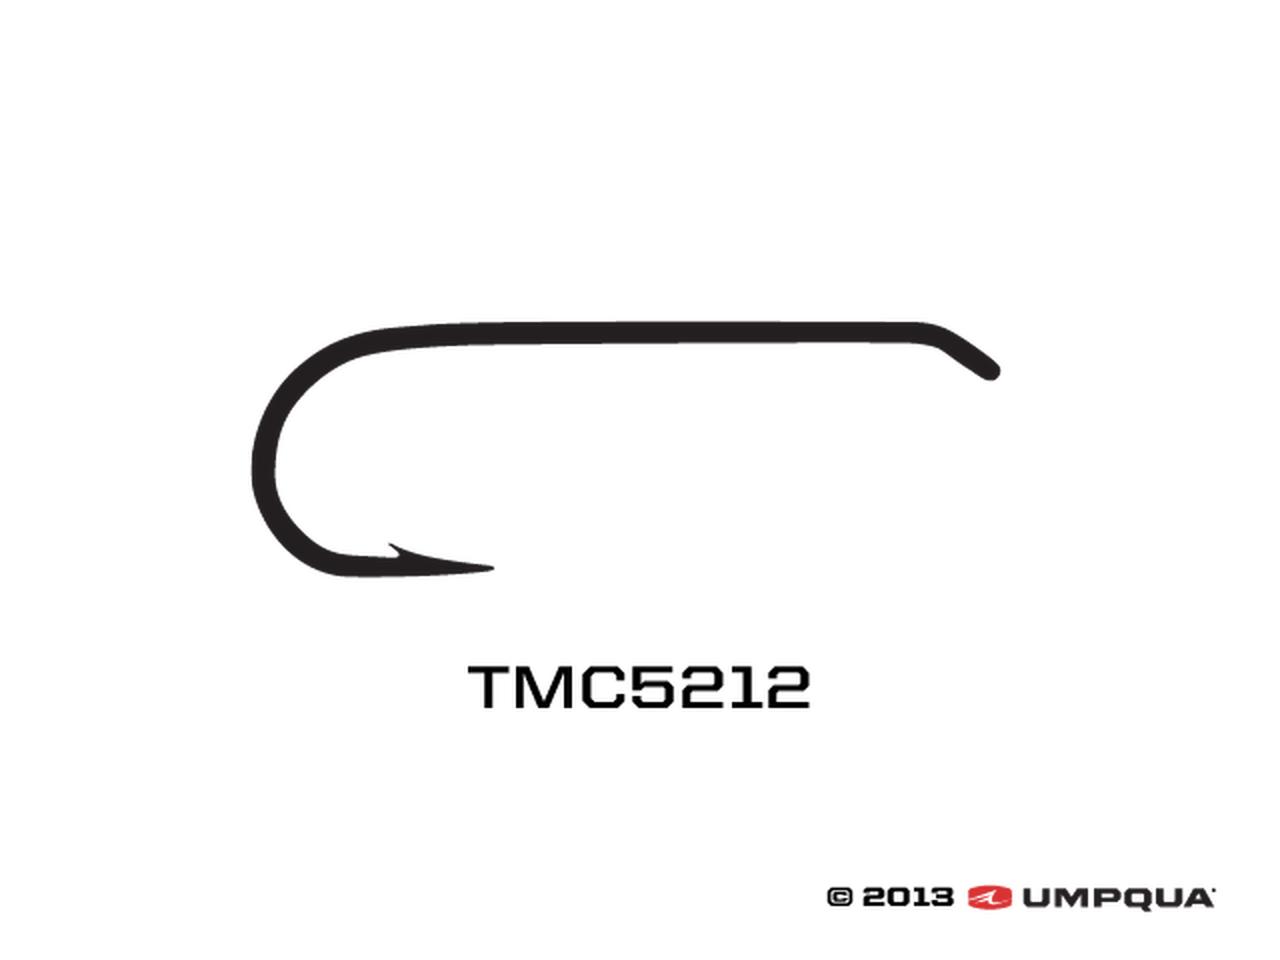 Tiemco TMC 5212